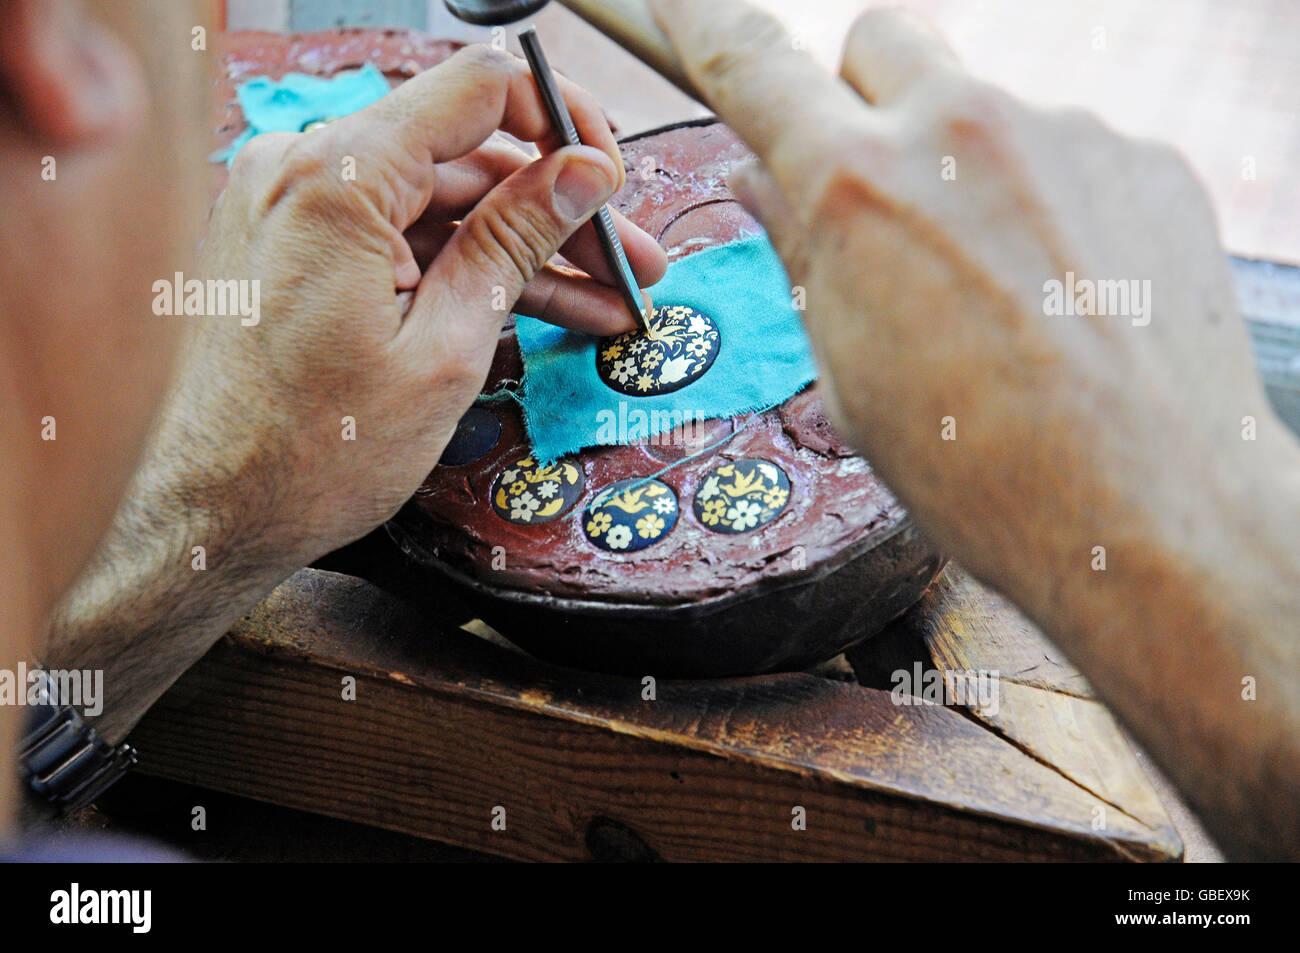 Damasquinado, typical traditional handicraft, gold work, goldsmith, Toledo, Castile-La Mancha, Spain - Stock Image